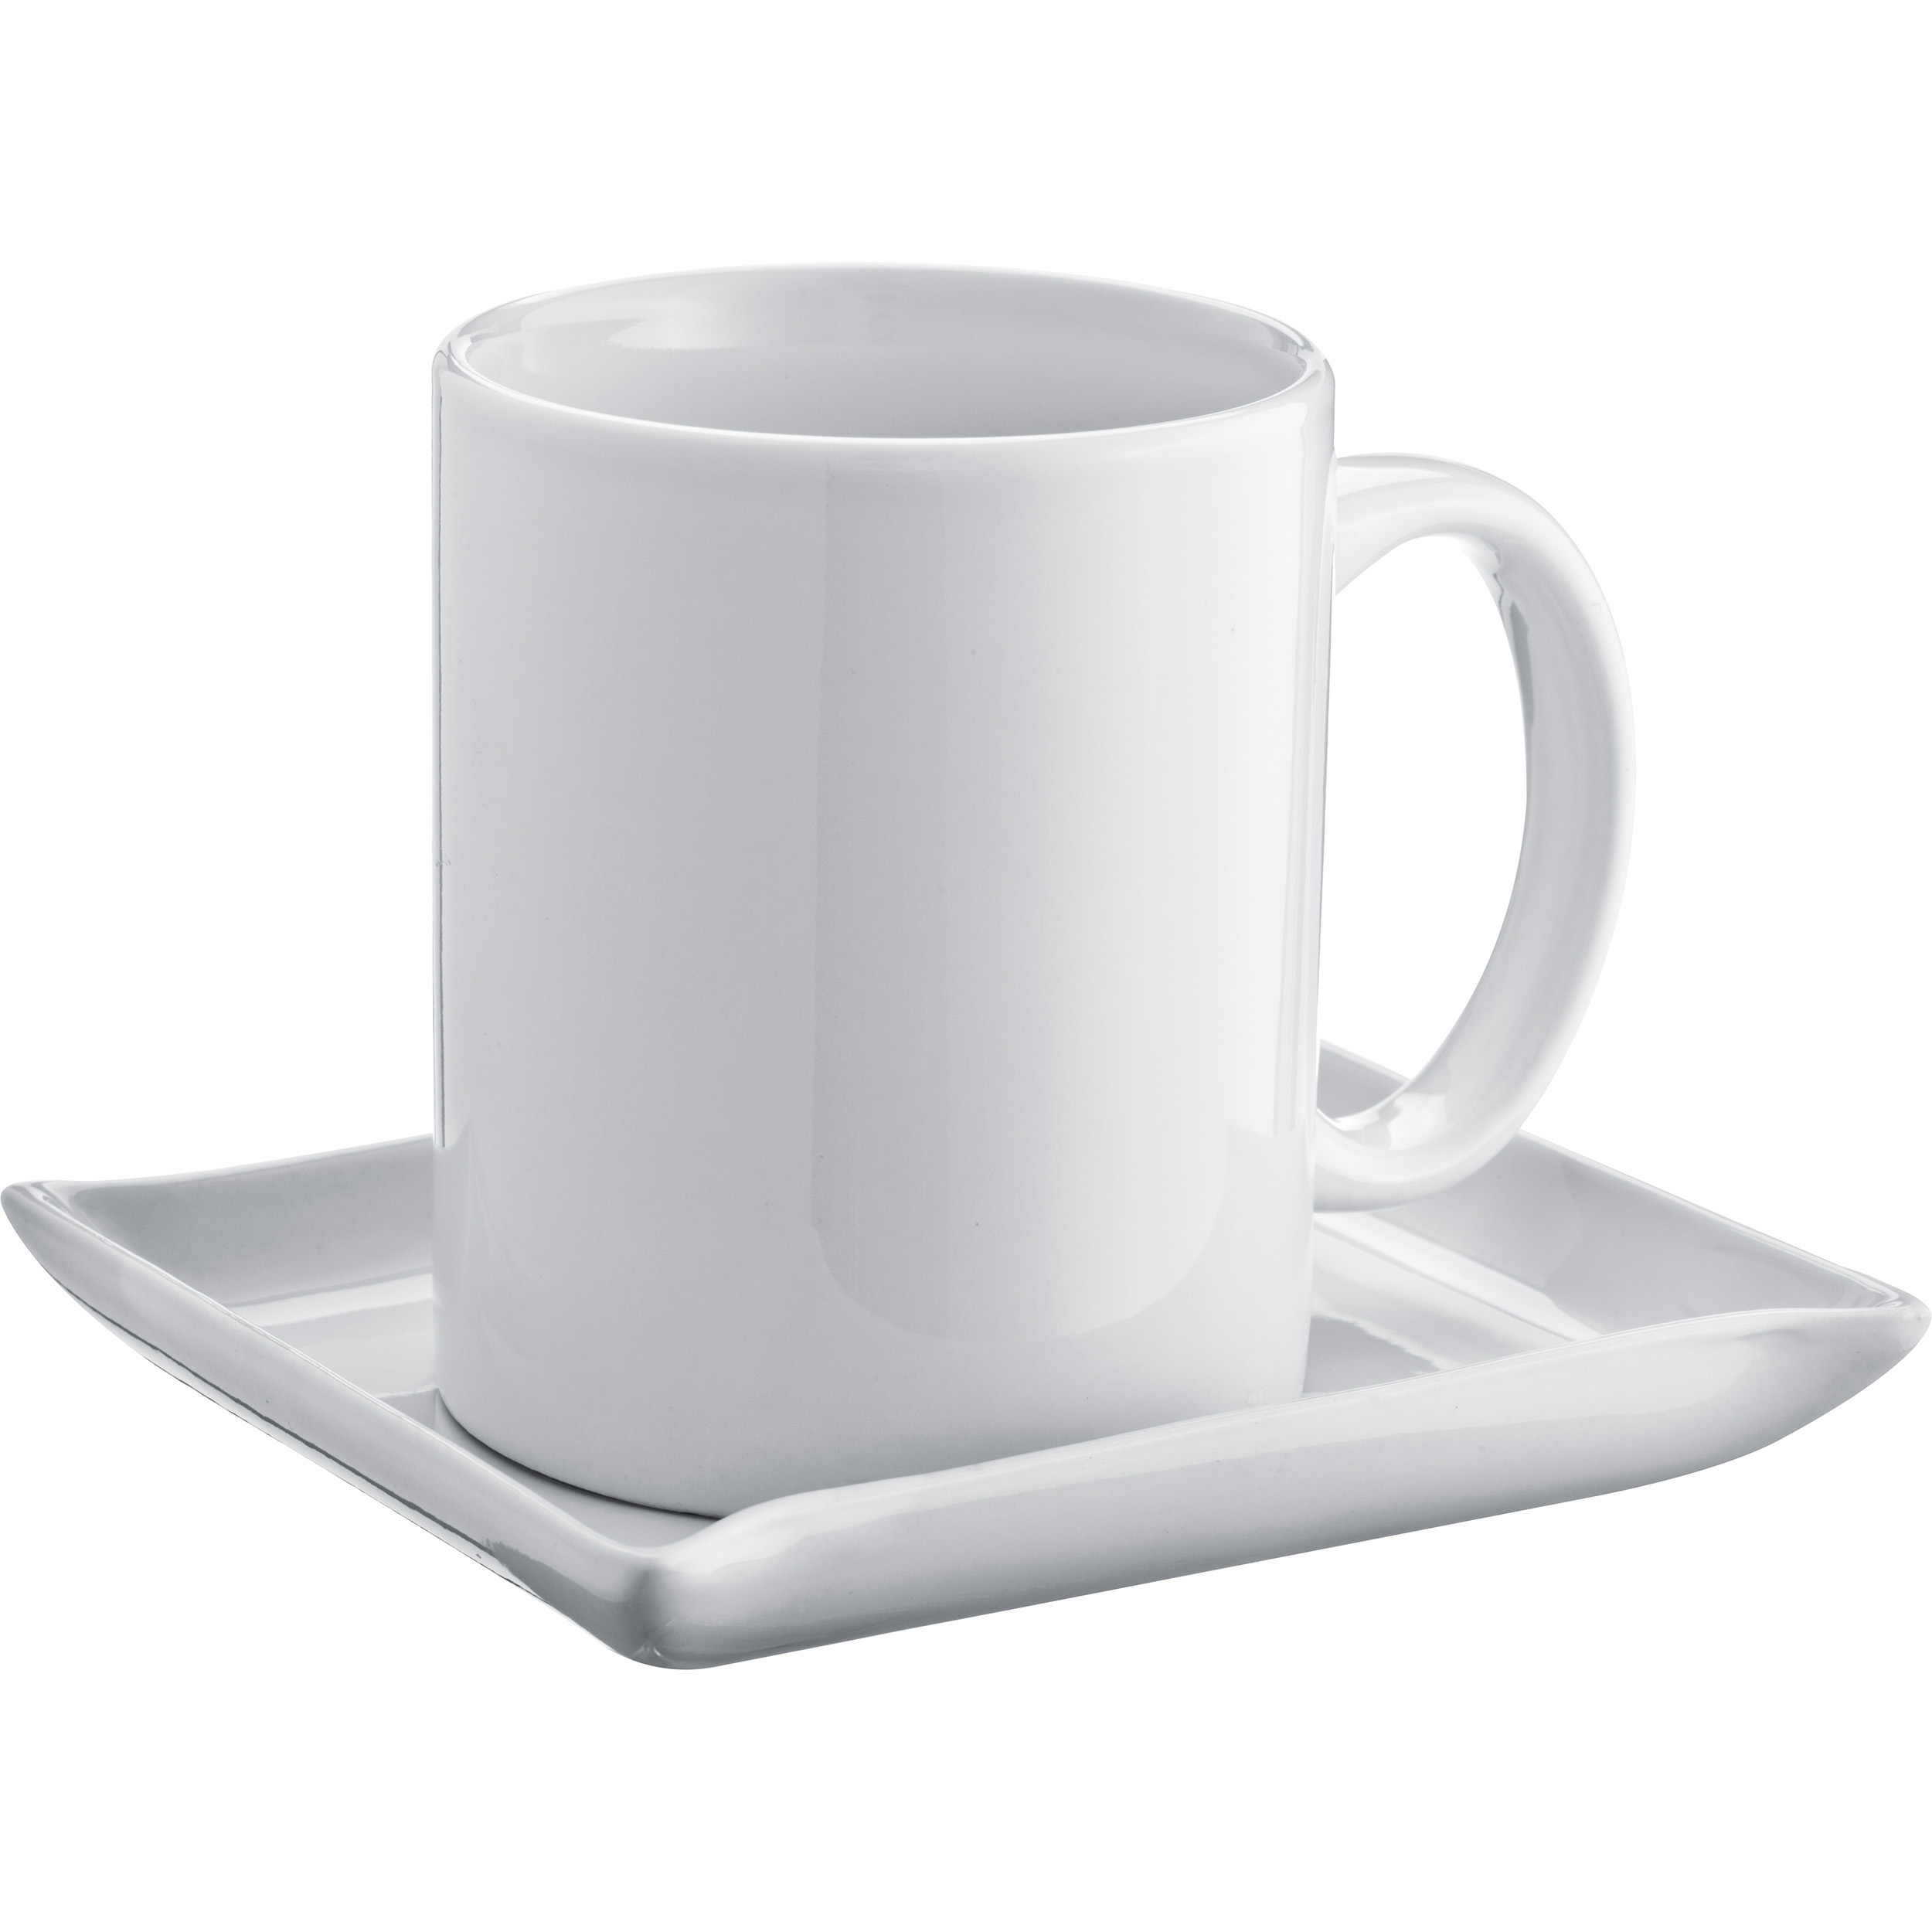 Set of coffee mug and coaster